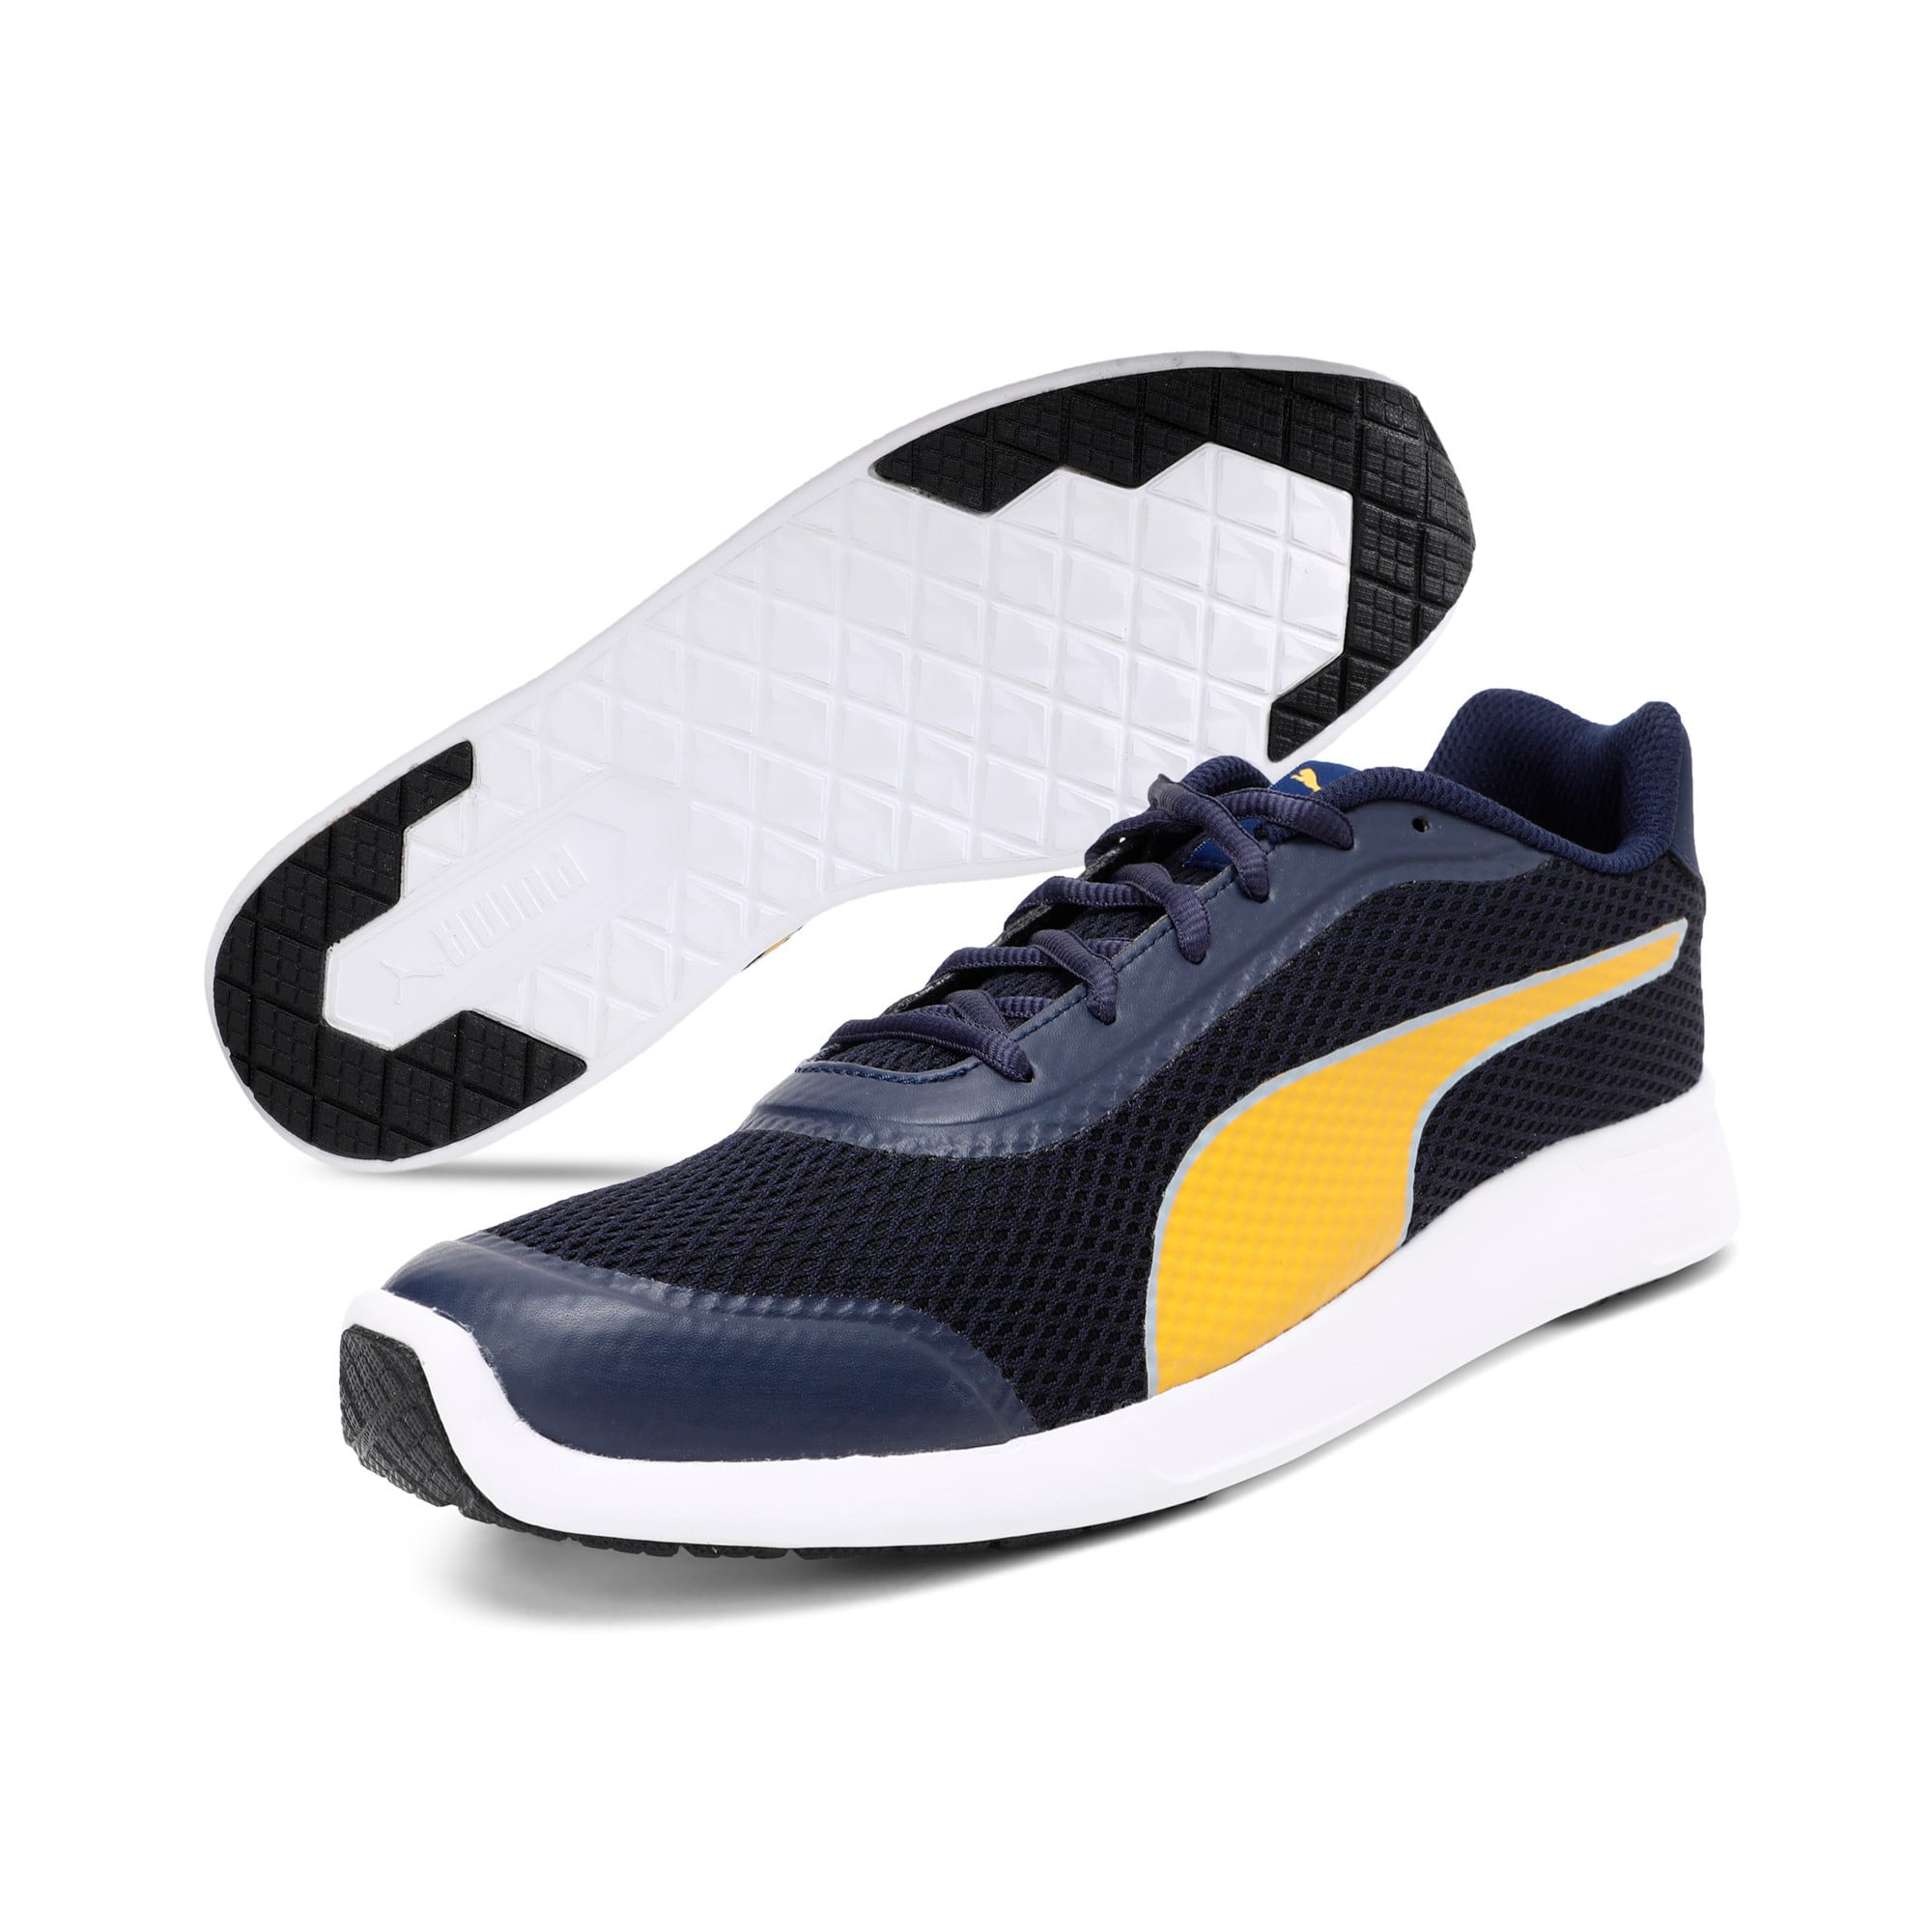 Thumbnail 2 of FST Runner v2 IDP Men's Sportstyle Shoes, Dark Shadow-Silver-Quarry, medium-IND